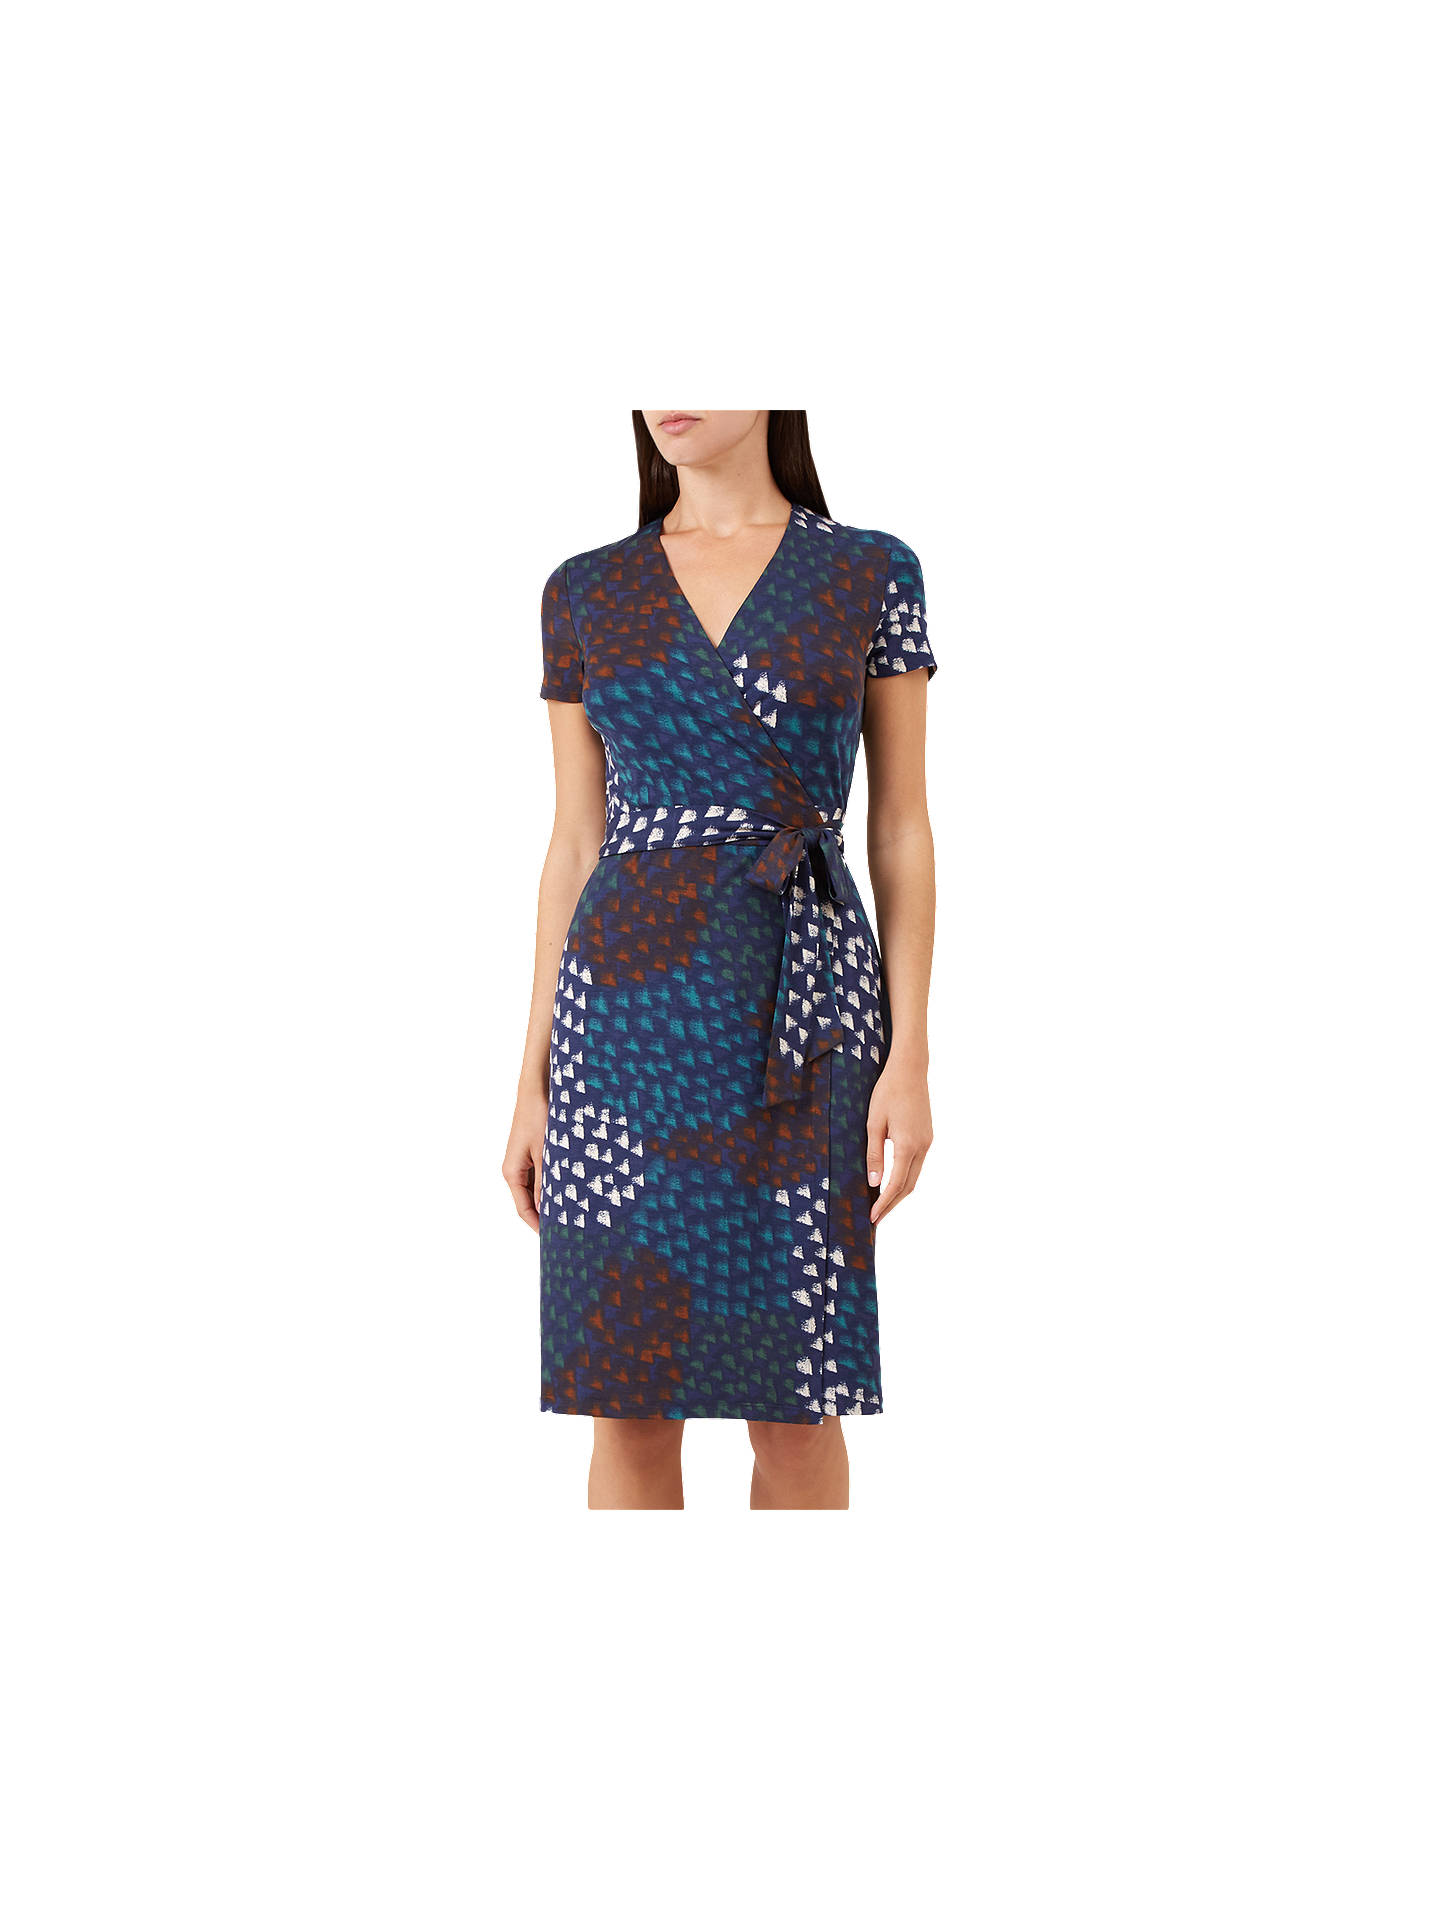 a0997354be2 Buy Hobbs Delilah Wrap Dress, Navy, 6 Online at johnlewis.com ...